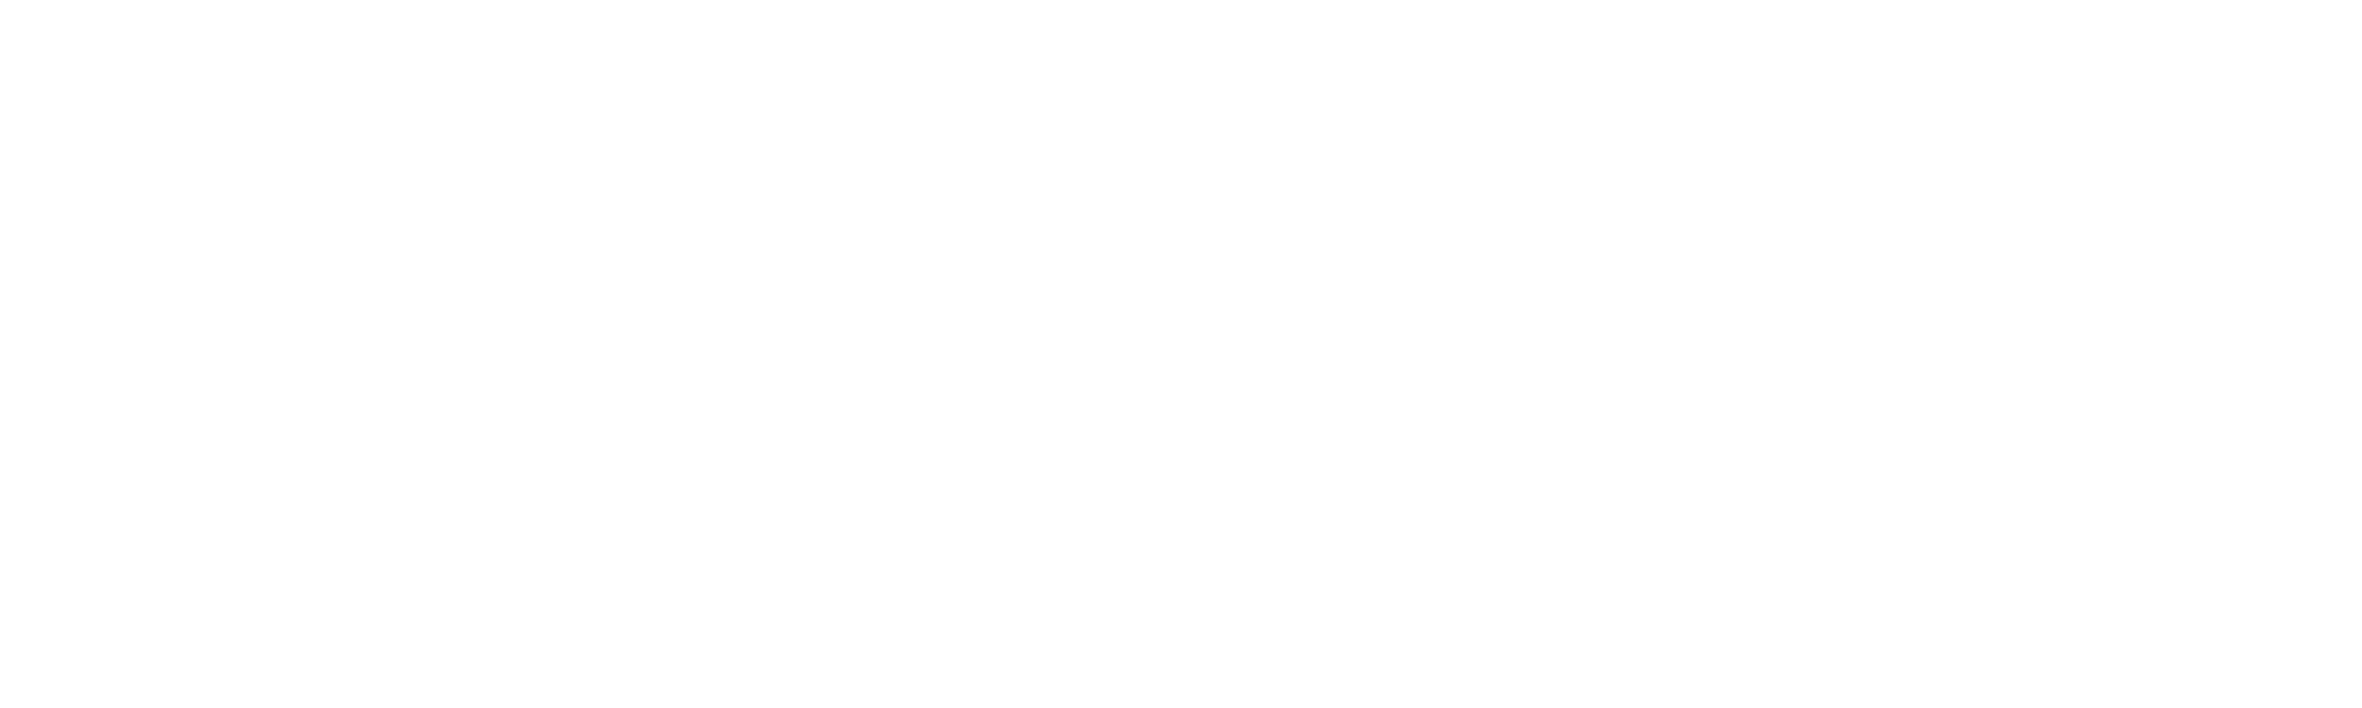 2362x708 Spotify Media Kit